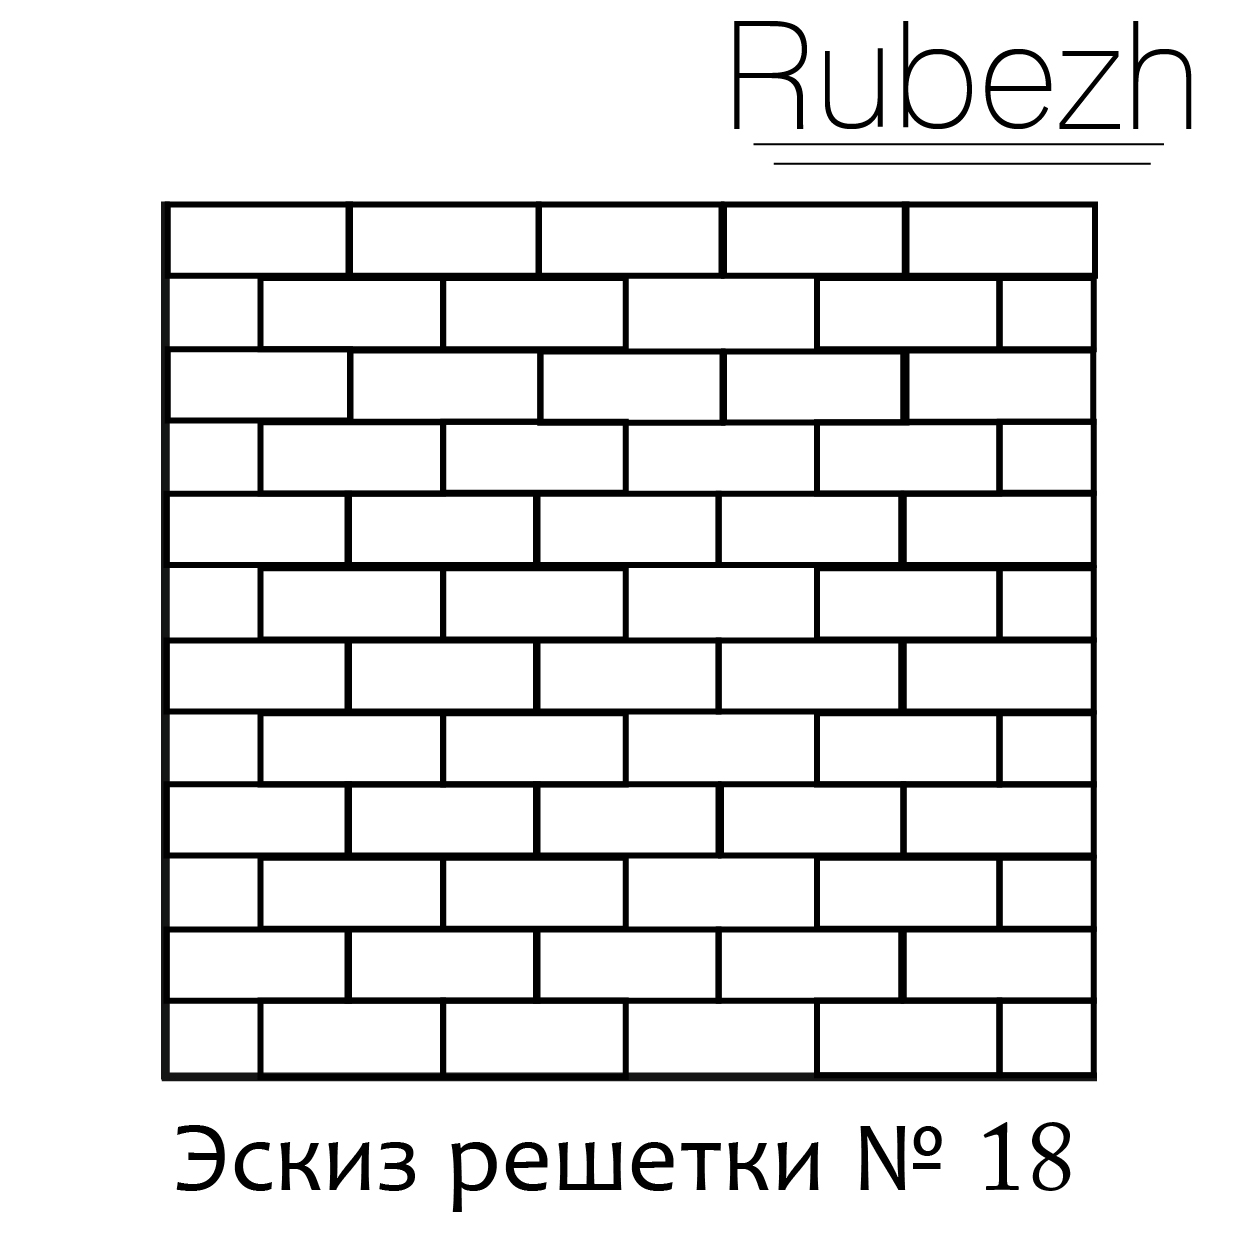 Эскиз решетки № 18